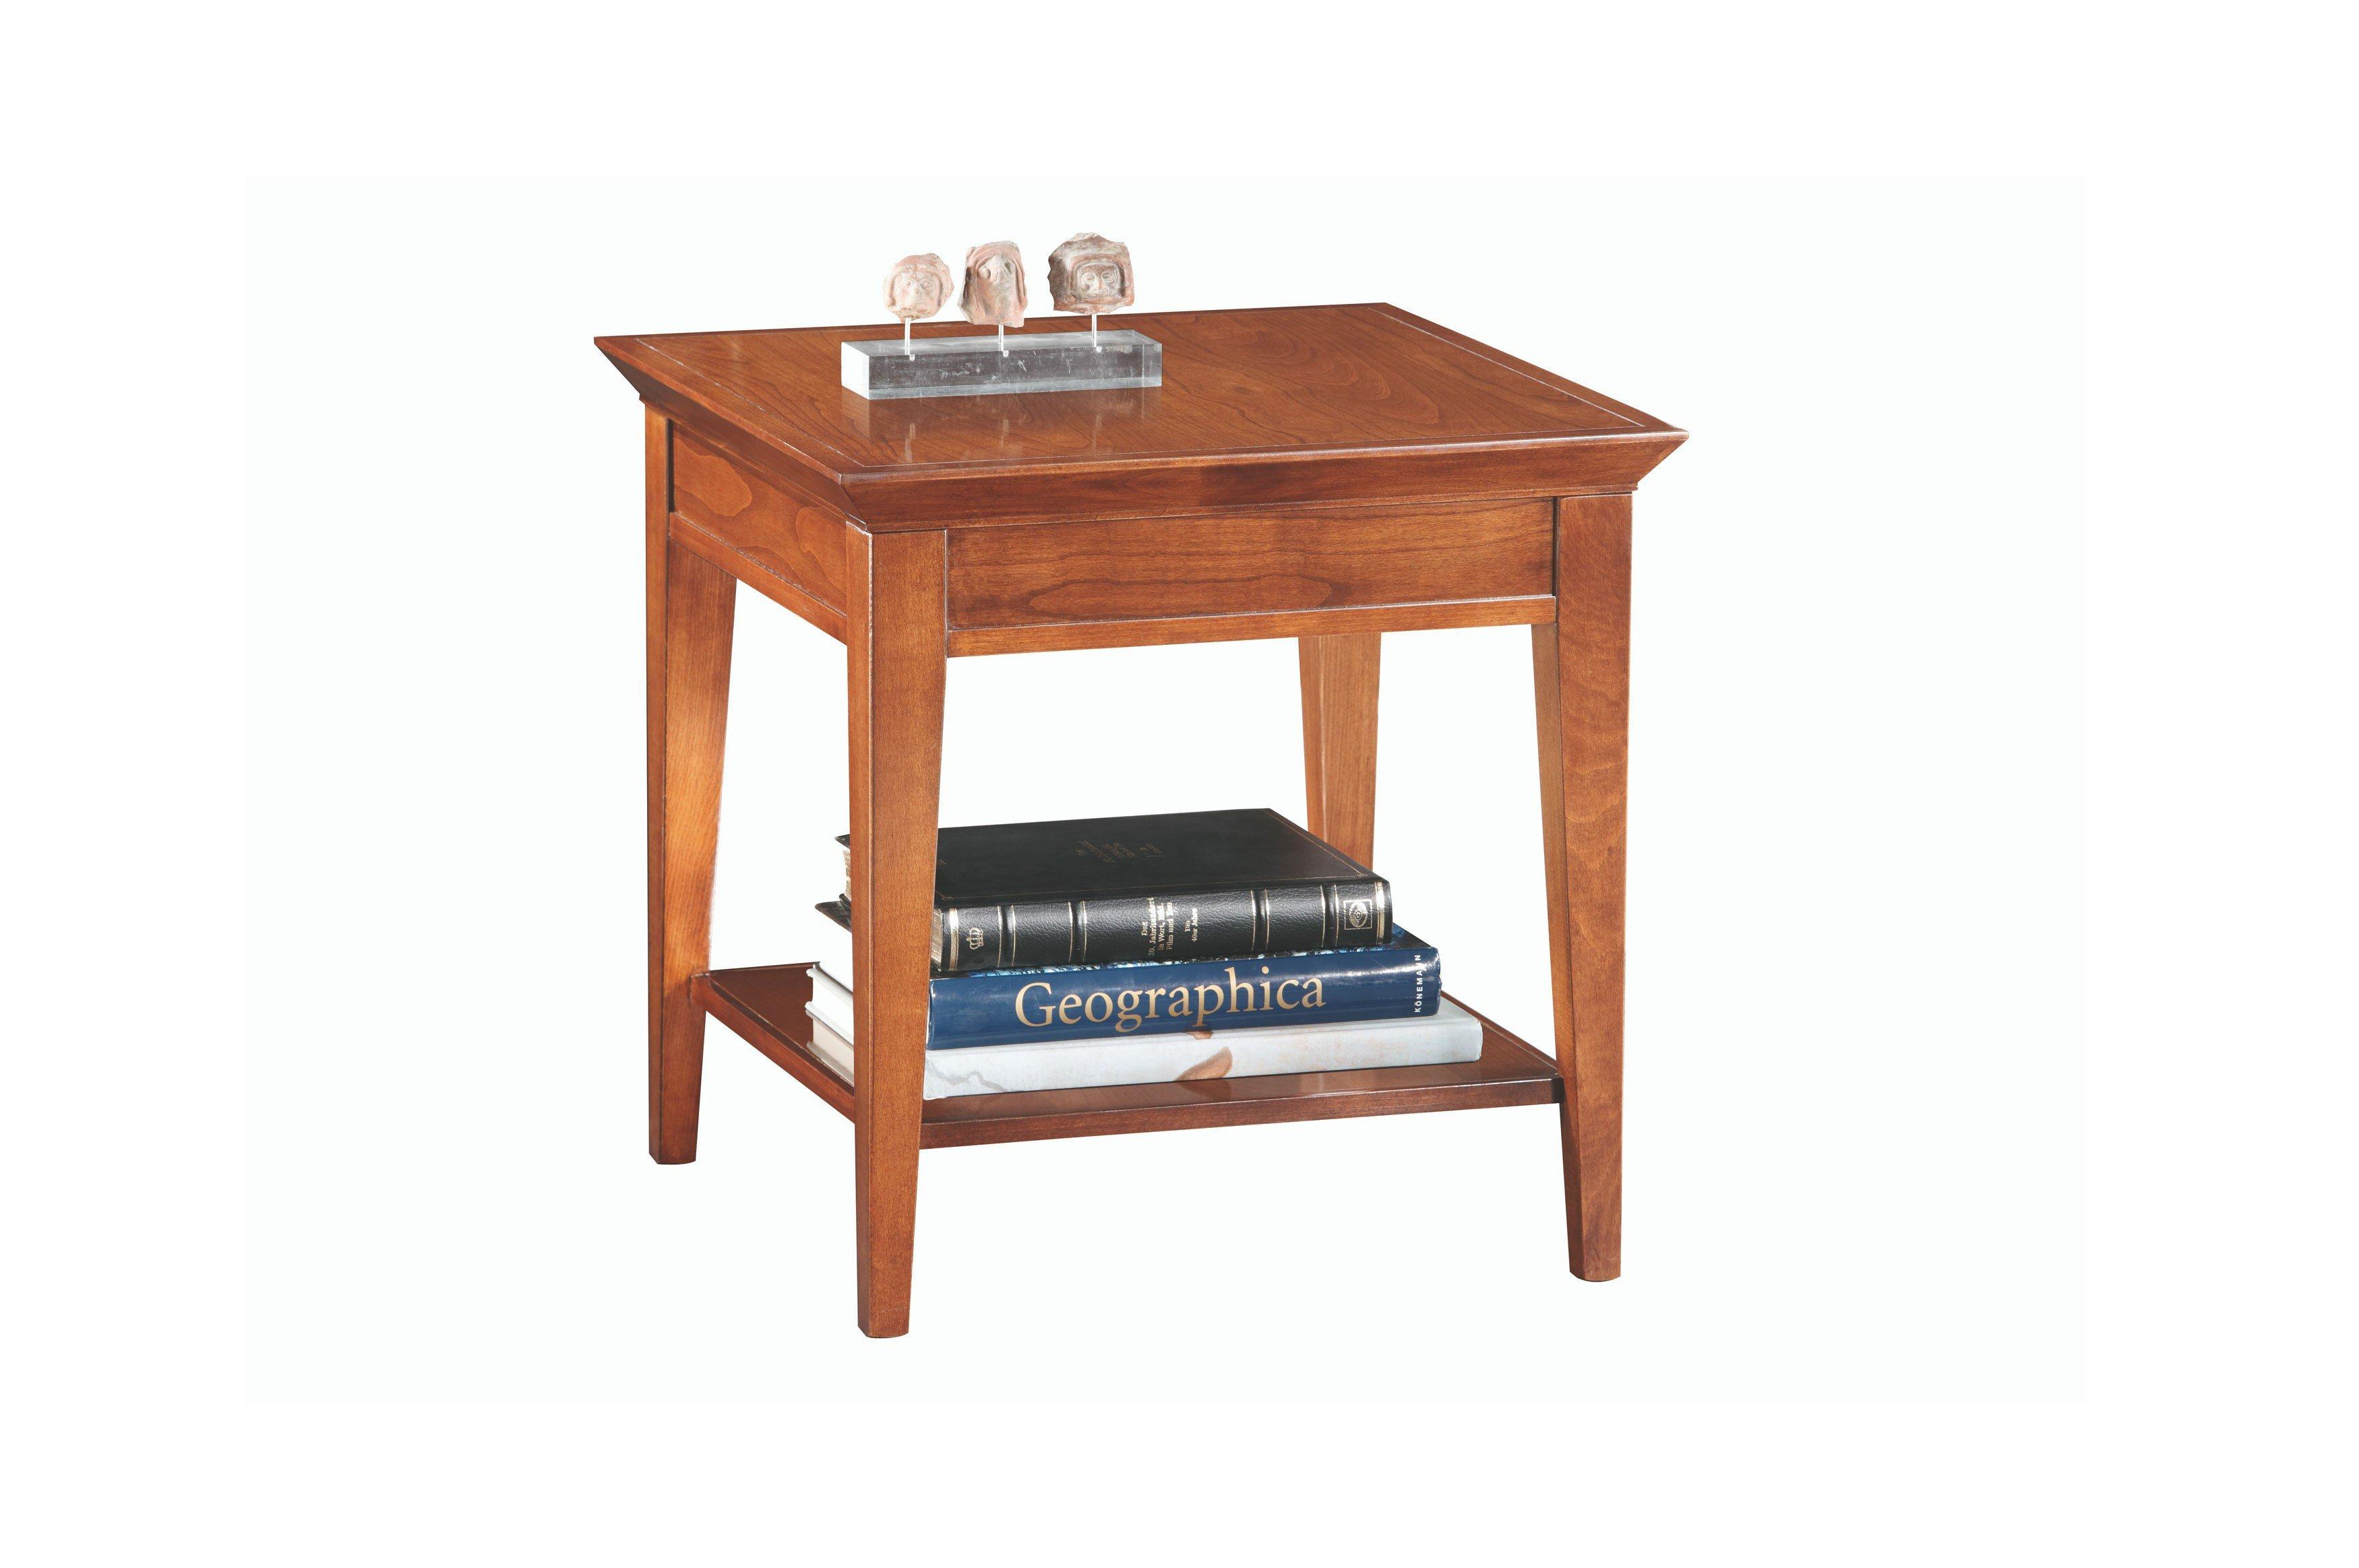 couchtisch selva sophia 3409 kirschbaumfarbig m bel letz. Black Bedroom Furniture Sets. Home Design Ideas